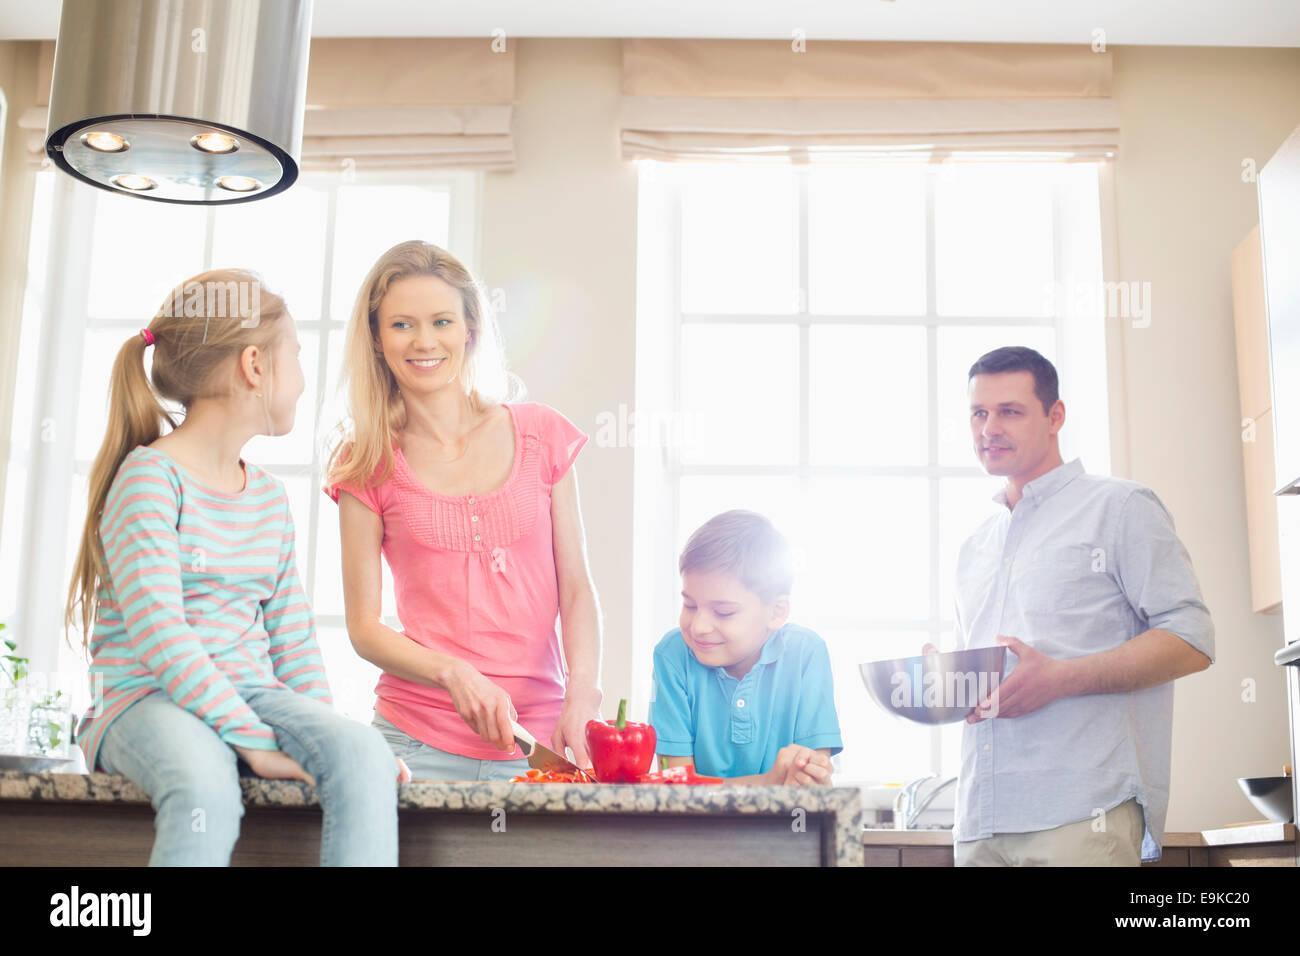 Family preparing food in kitchen - Stock Image